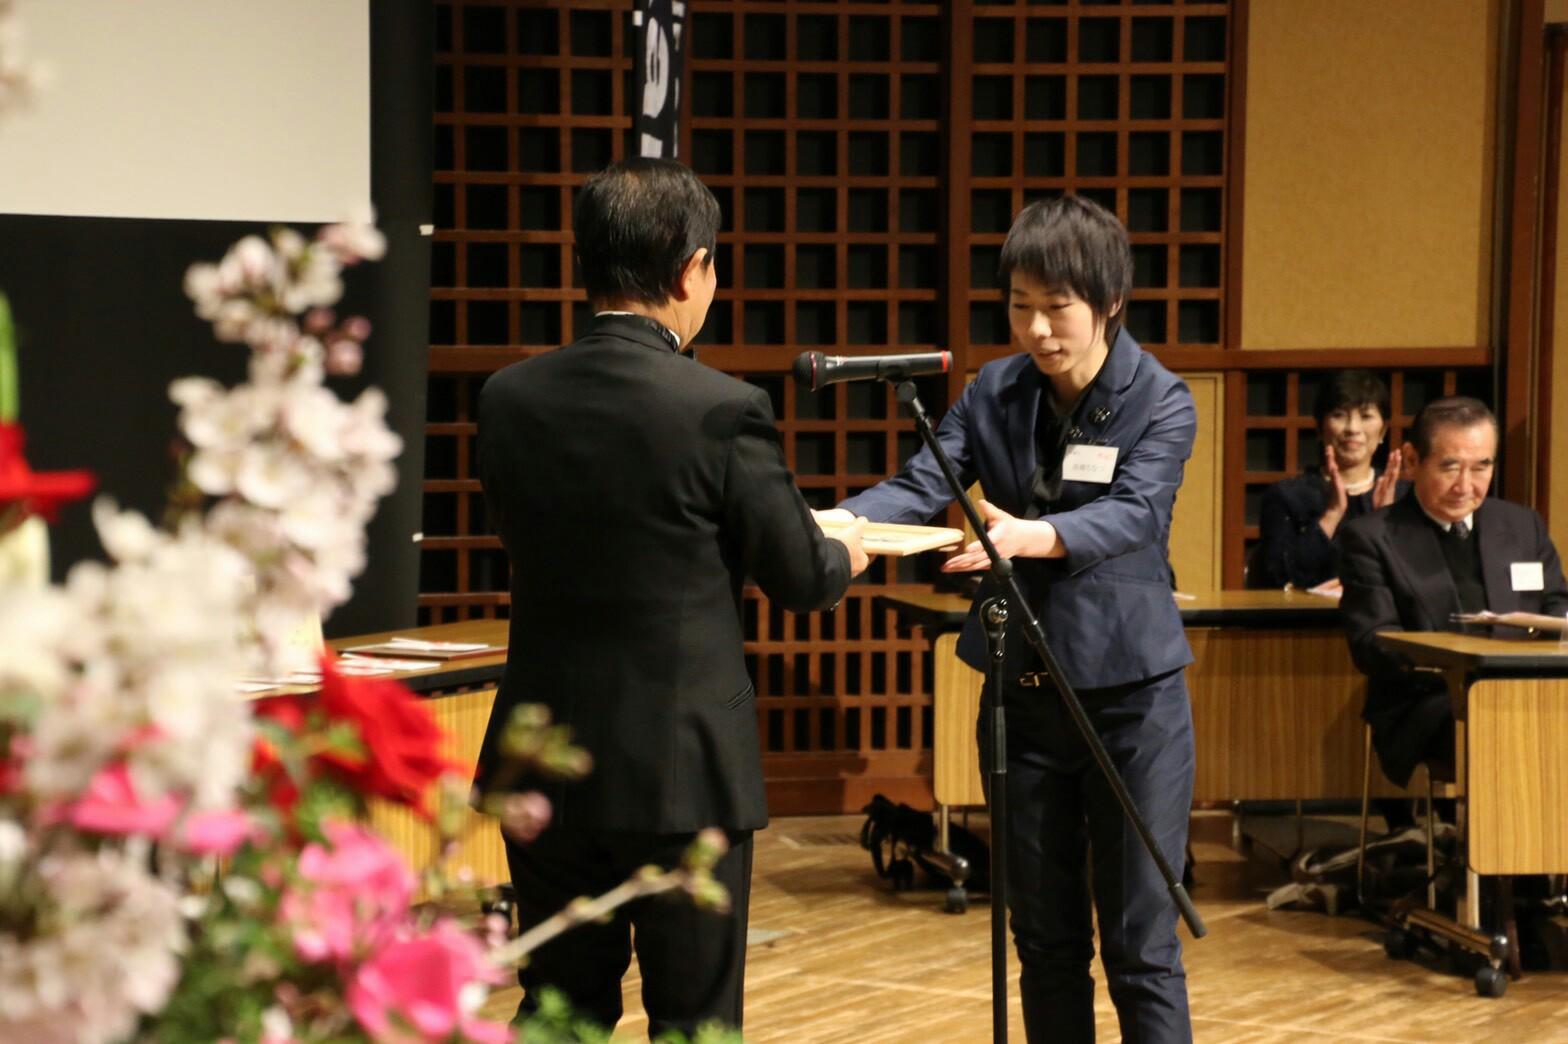 f:id:barber_kenji_saitama:20170406120111j:plain